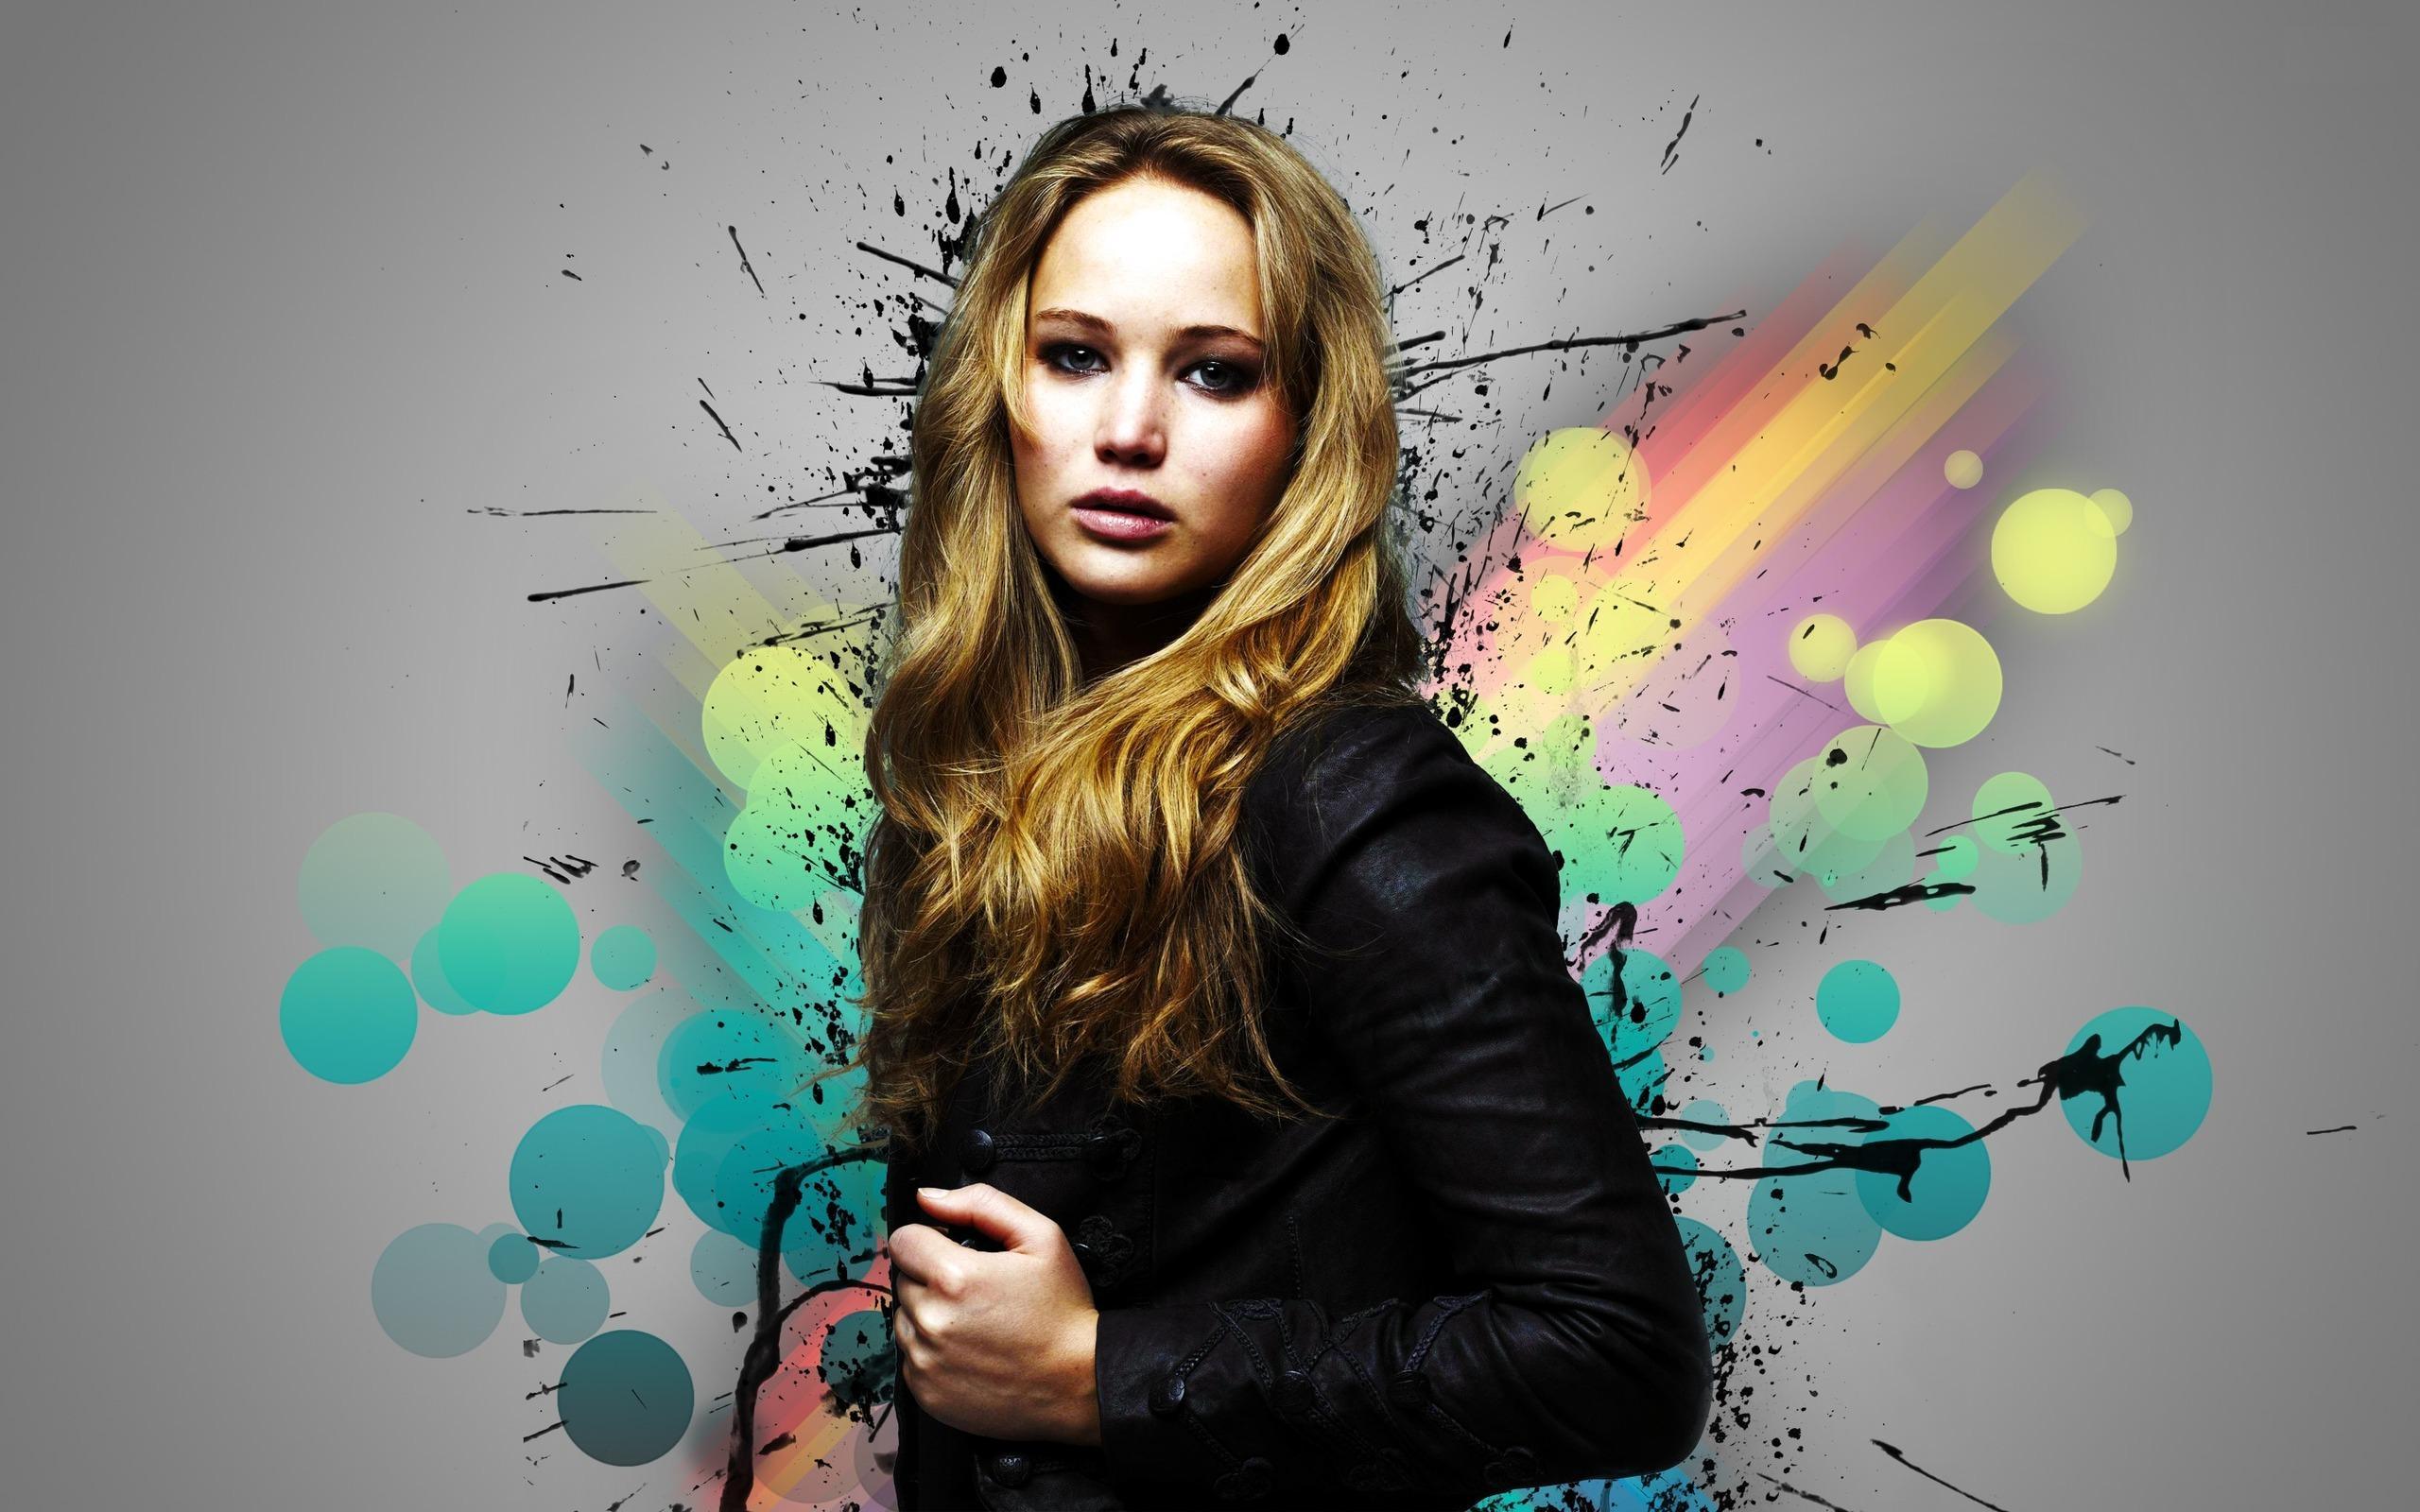 Download Jennifer Lawrence HD Wallpapers 2017 2560x1600